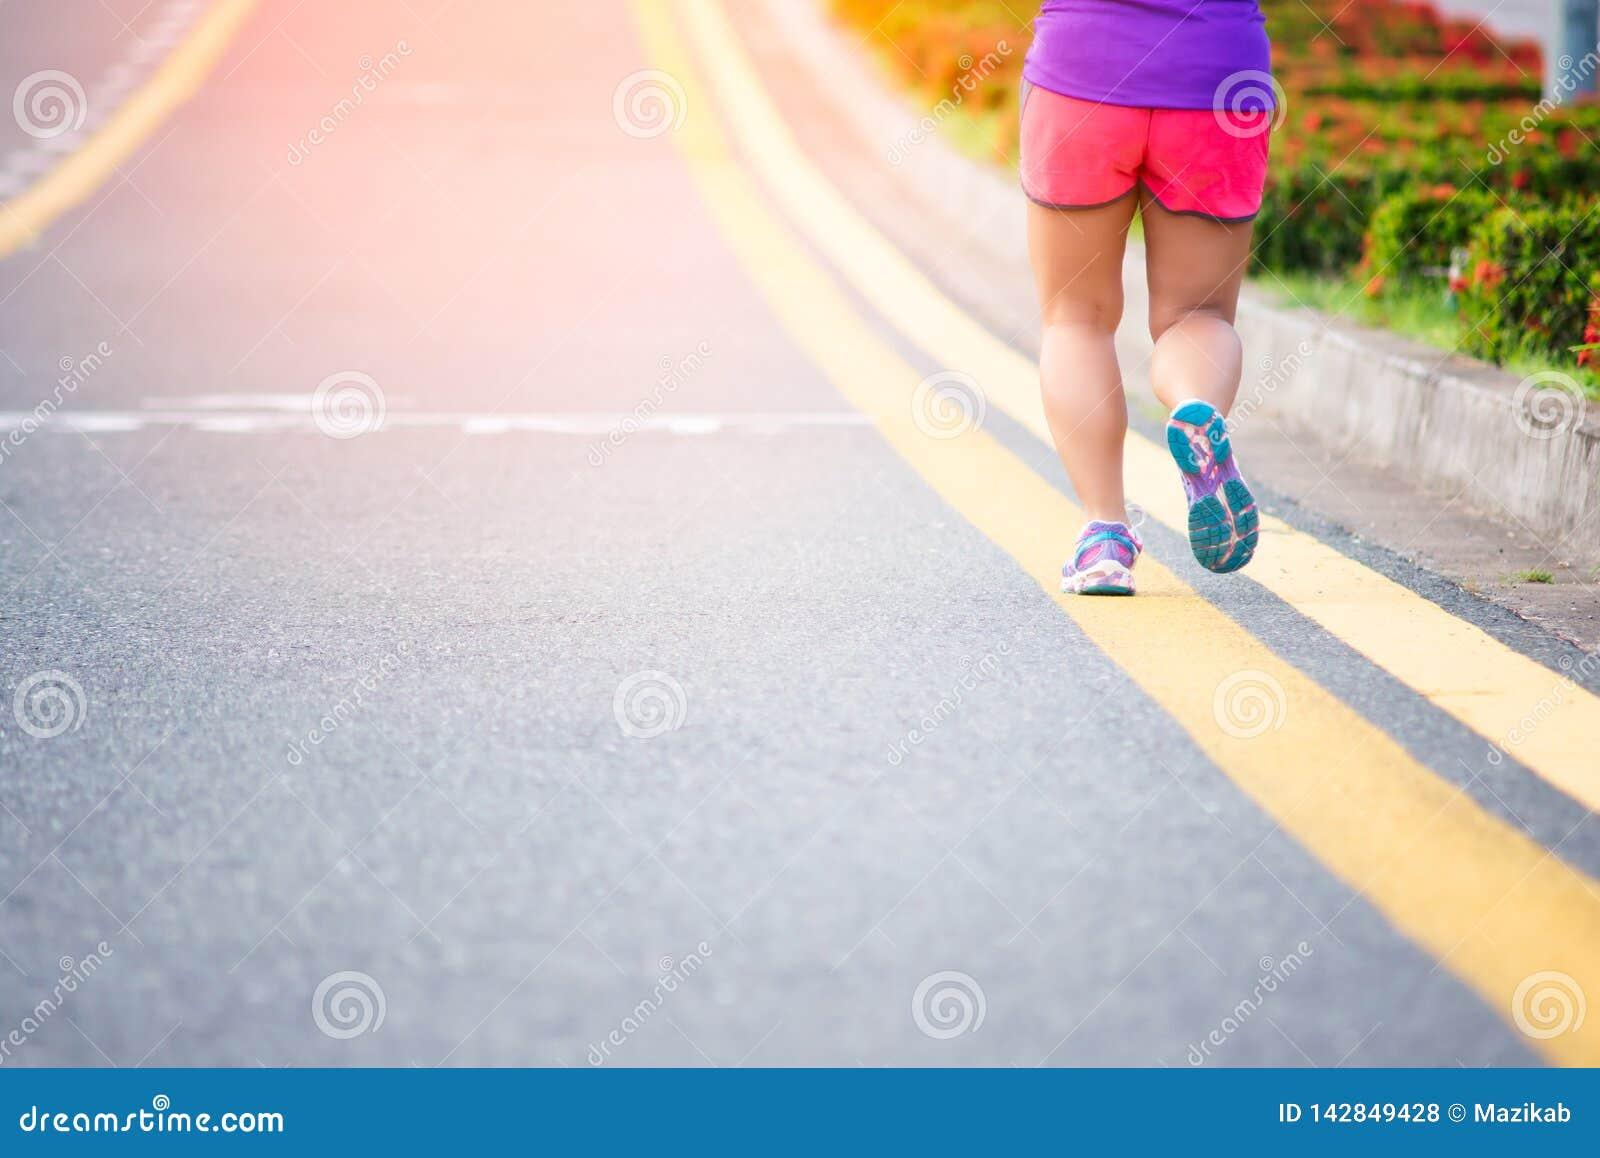 Jogger bieg